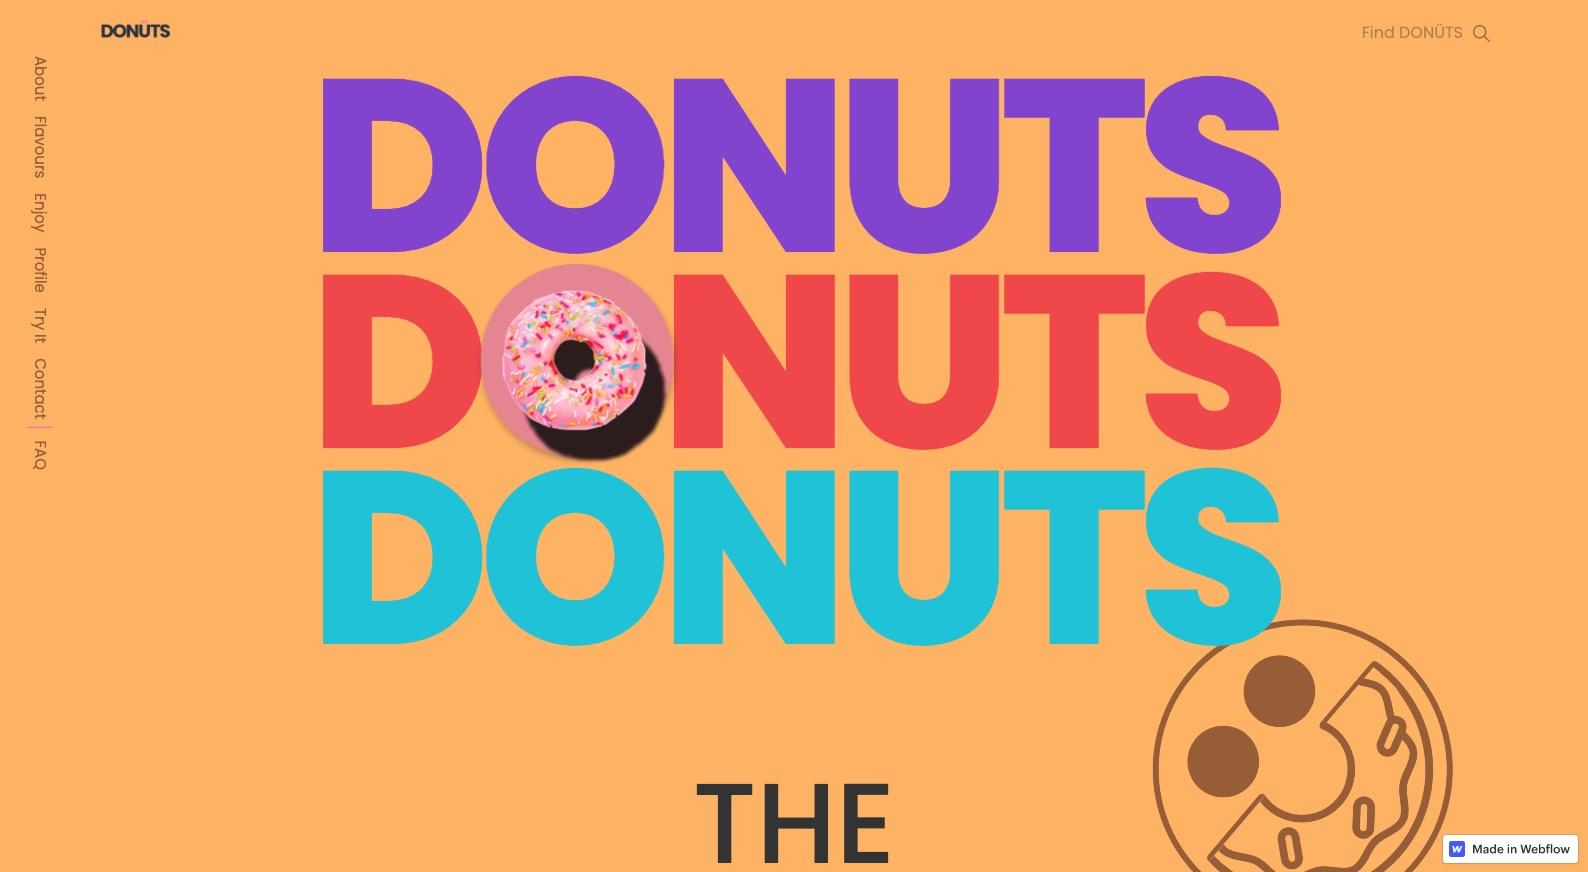 screenshot of Donuts website